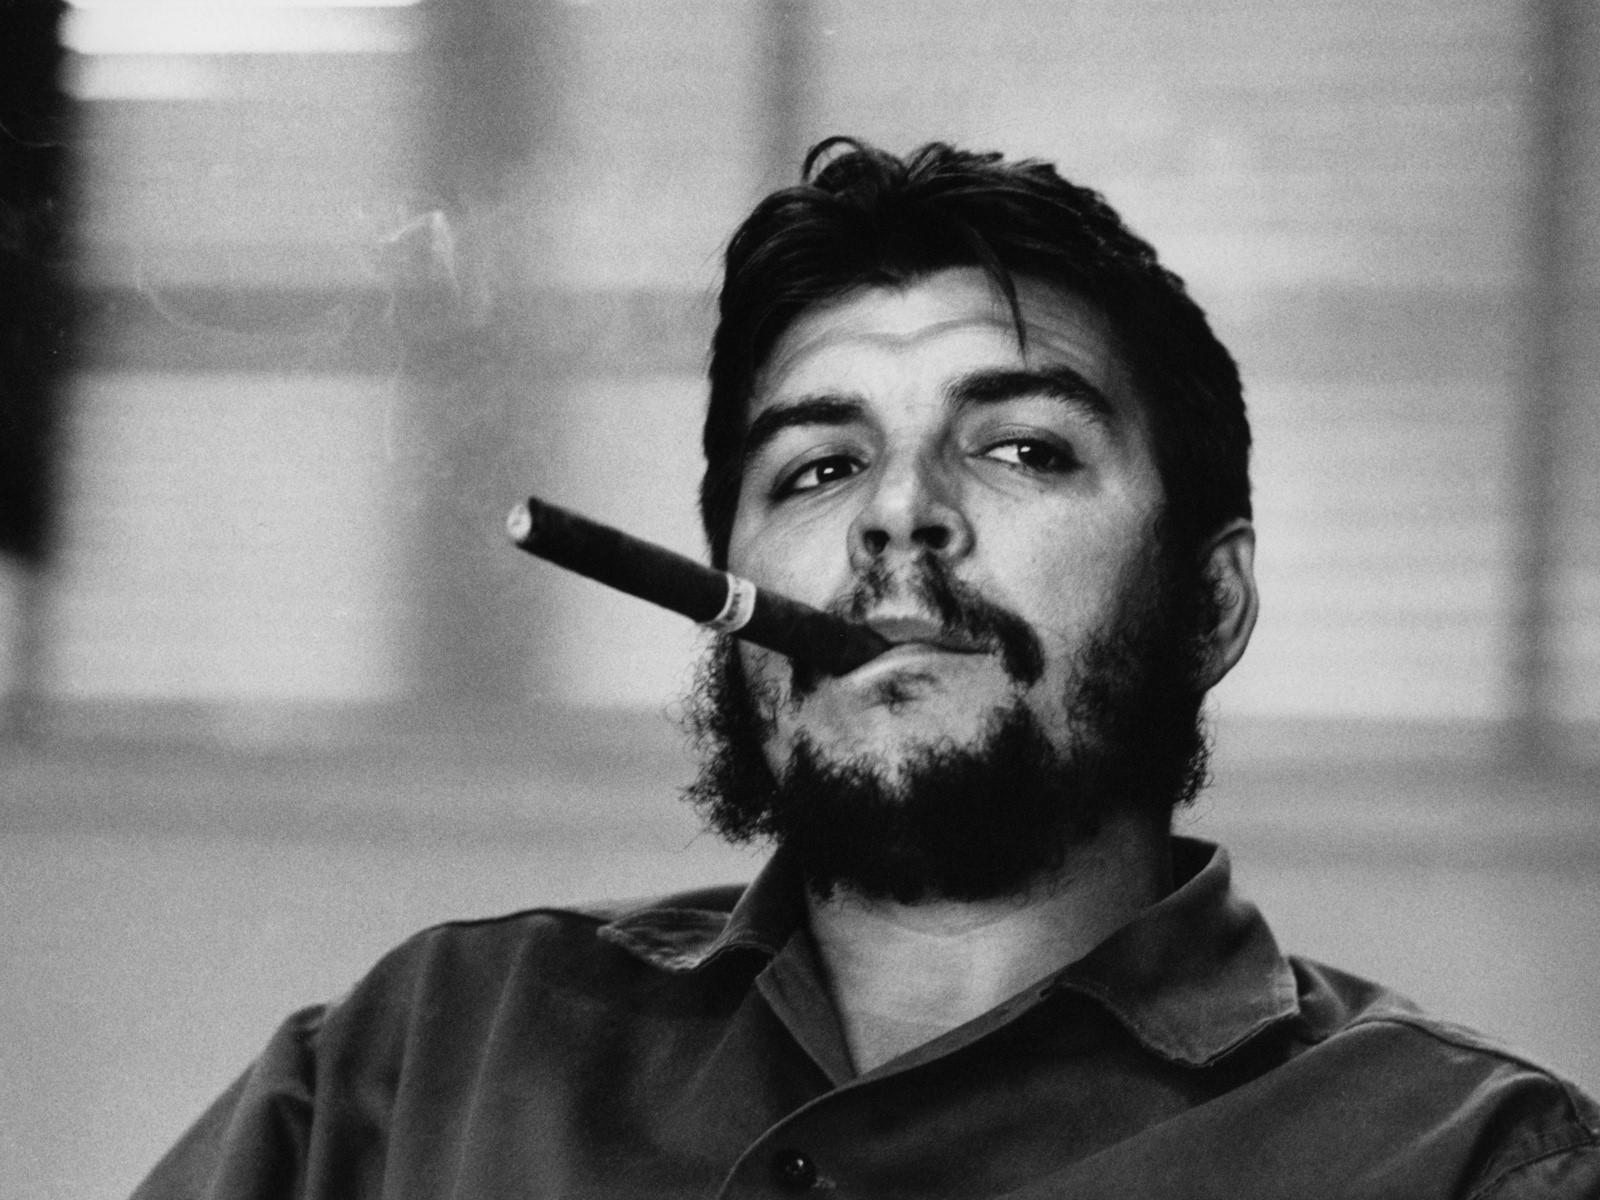 Хроника последних дней легендарного Че Геваре